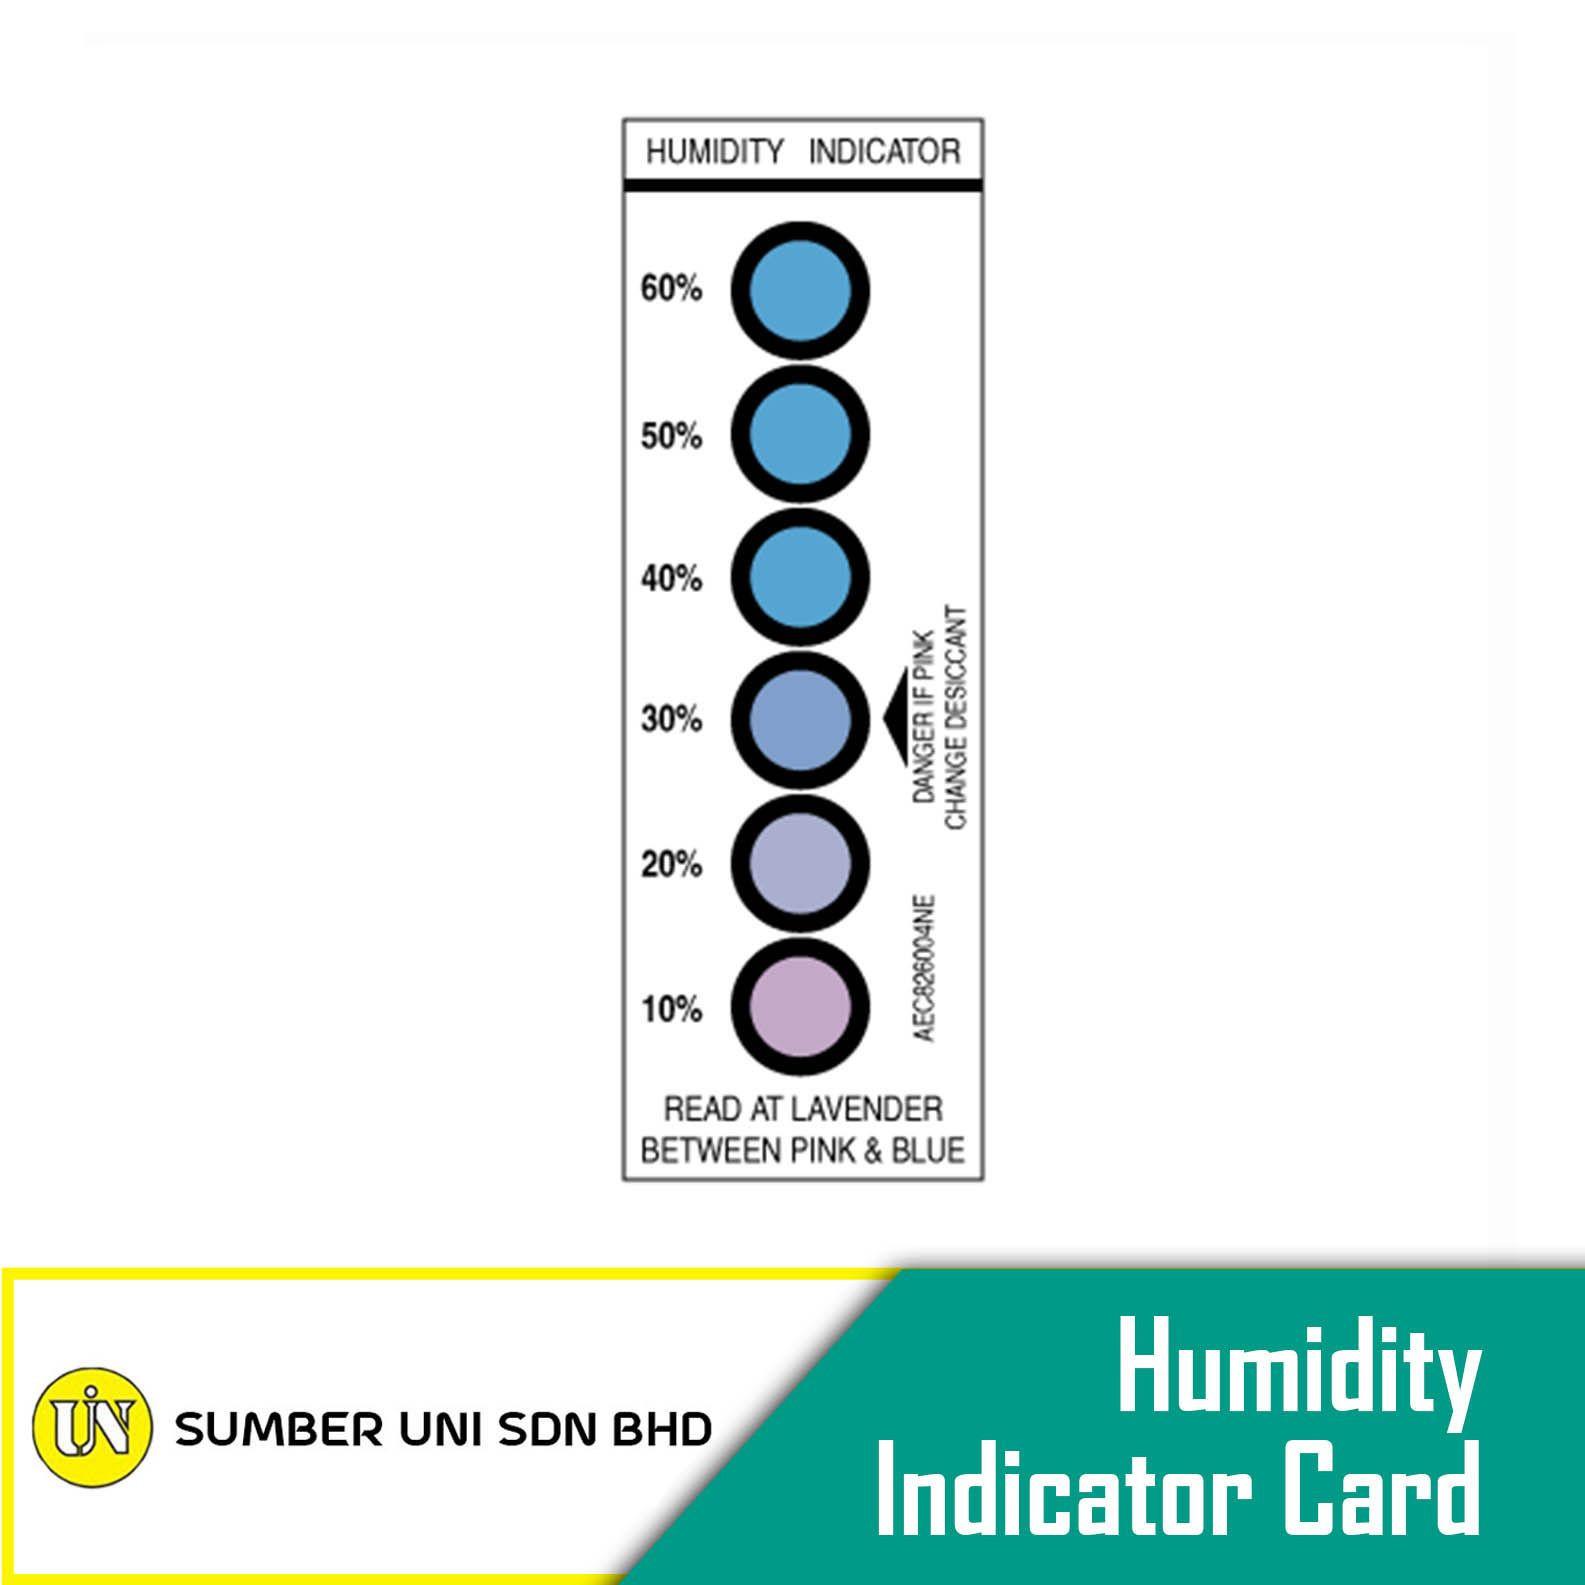 Humidity Indicator Card (HIC)